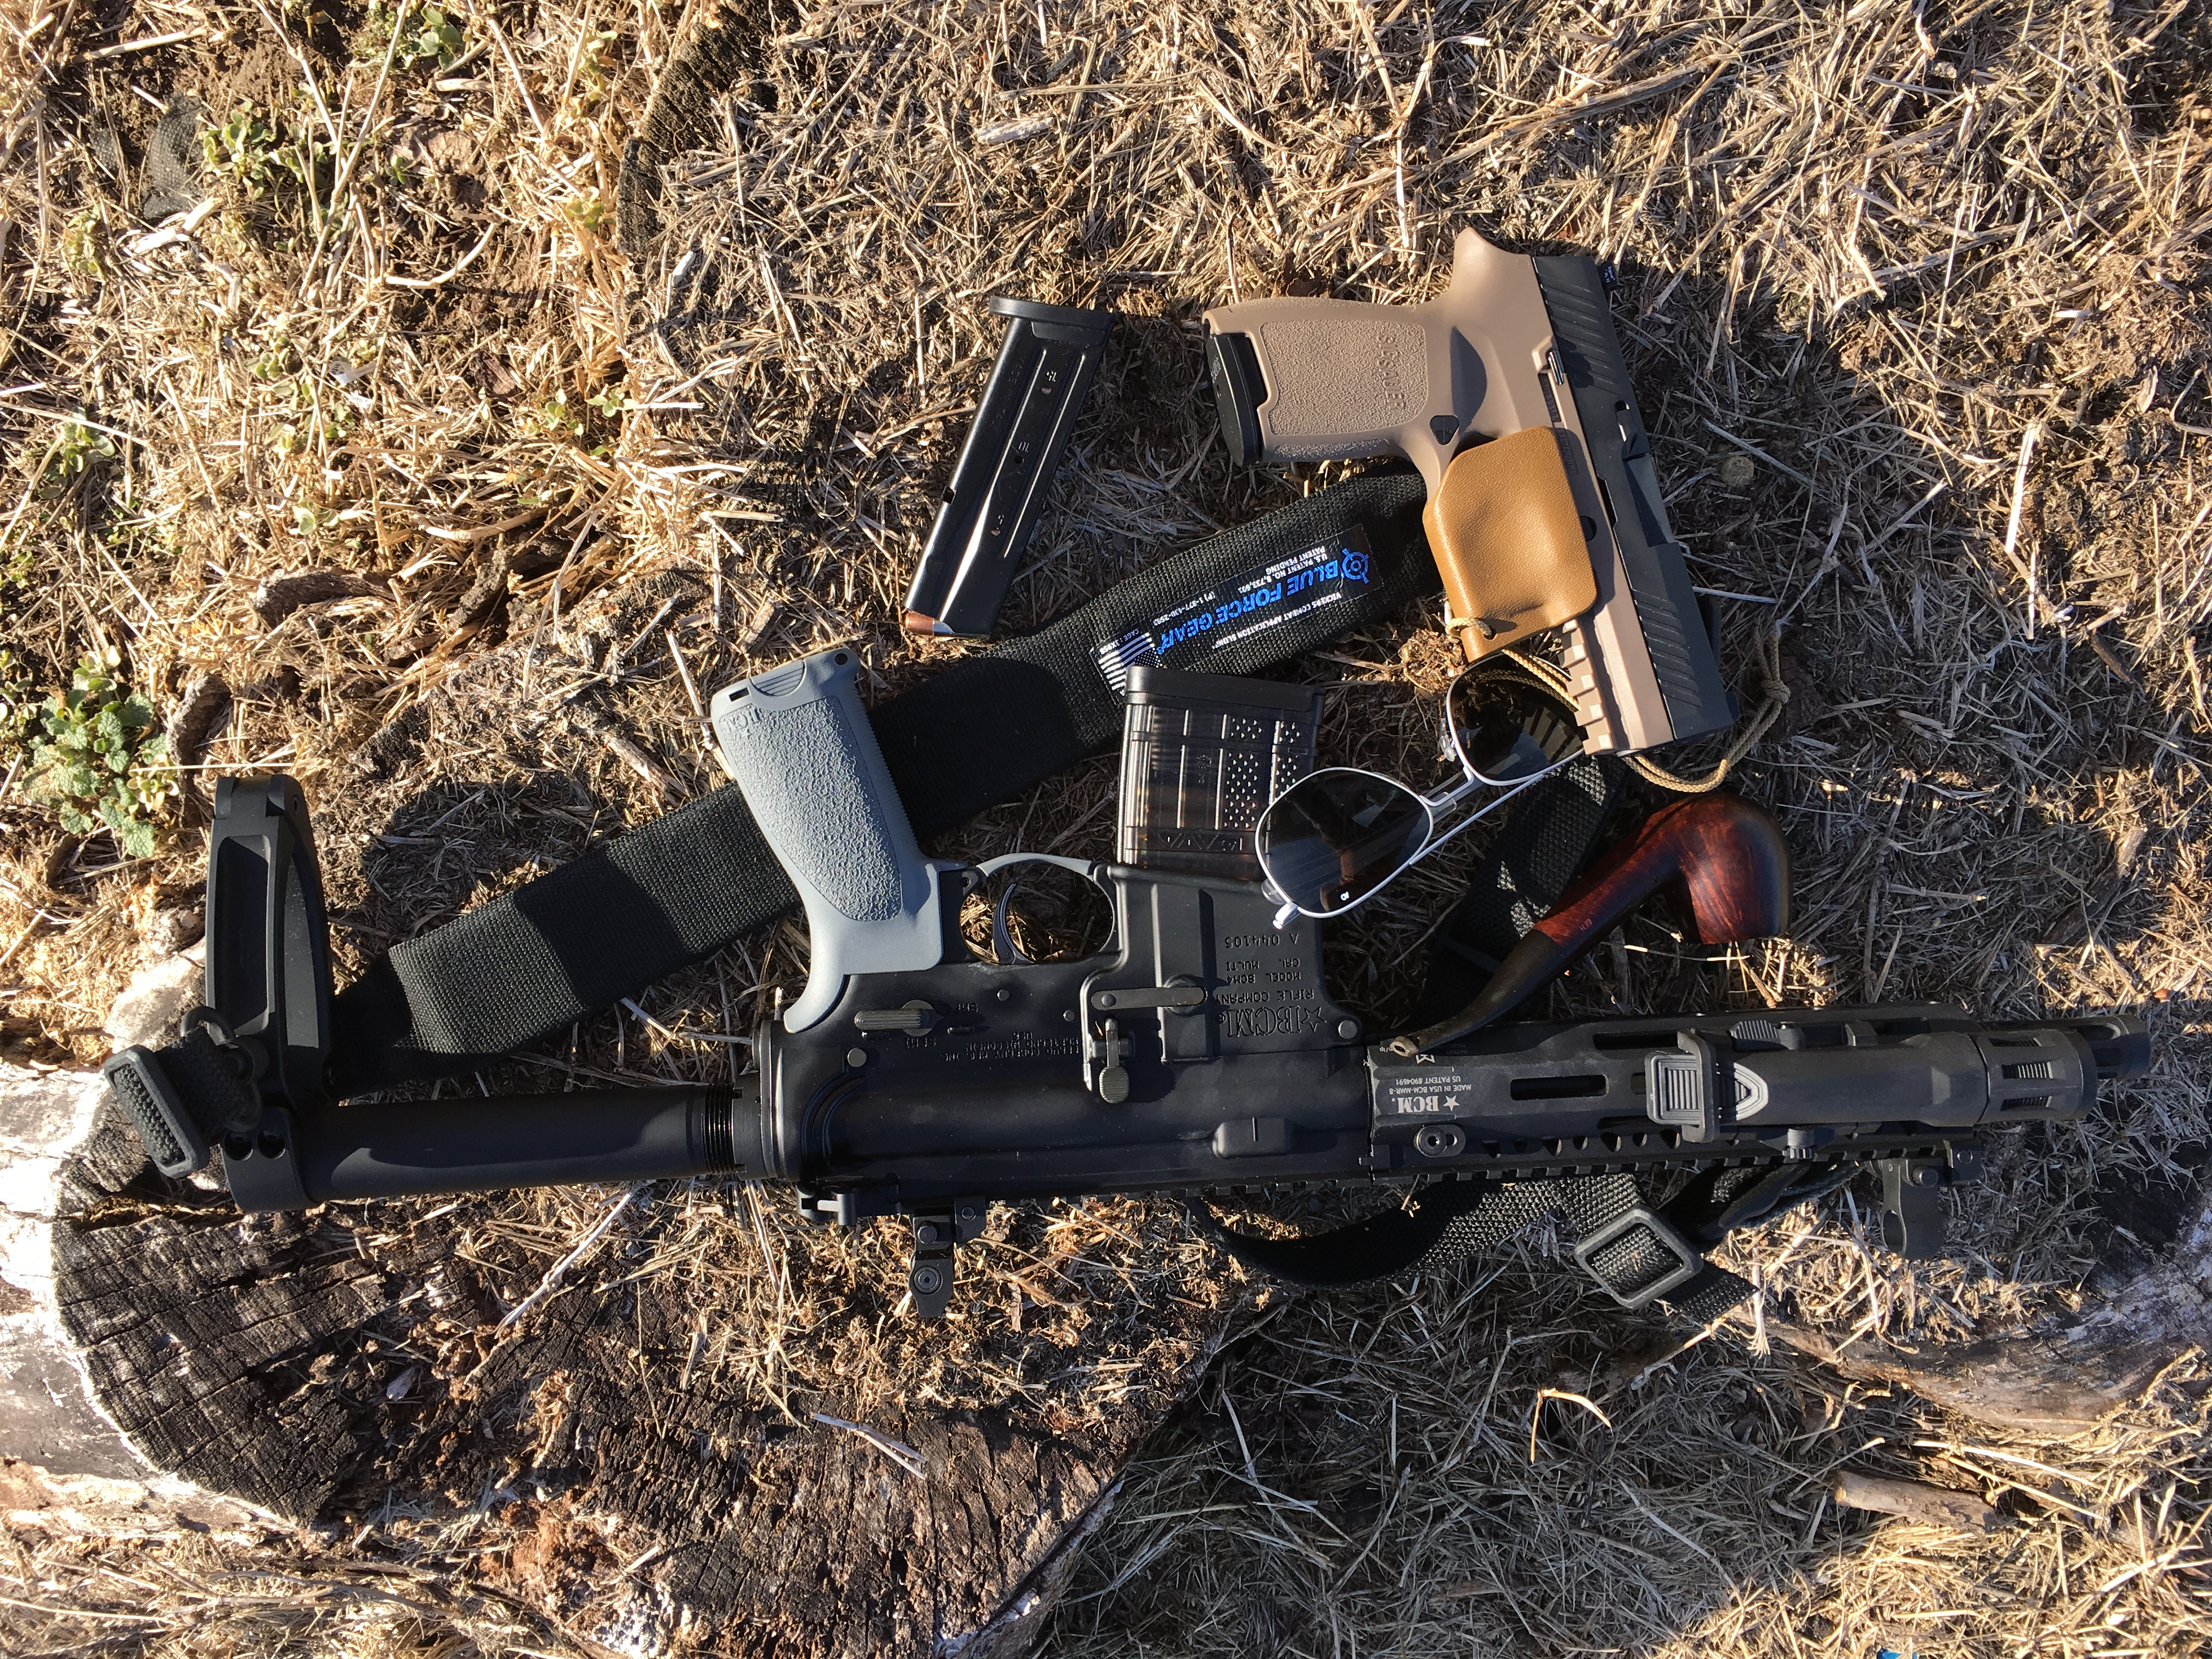 Defensive Long Gun:  How are the DC members setting them up?-c7e6795b-bb35-42f2-bd1a-b6bab58bf558.jpeg